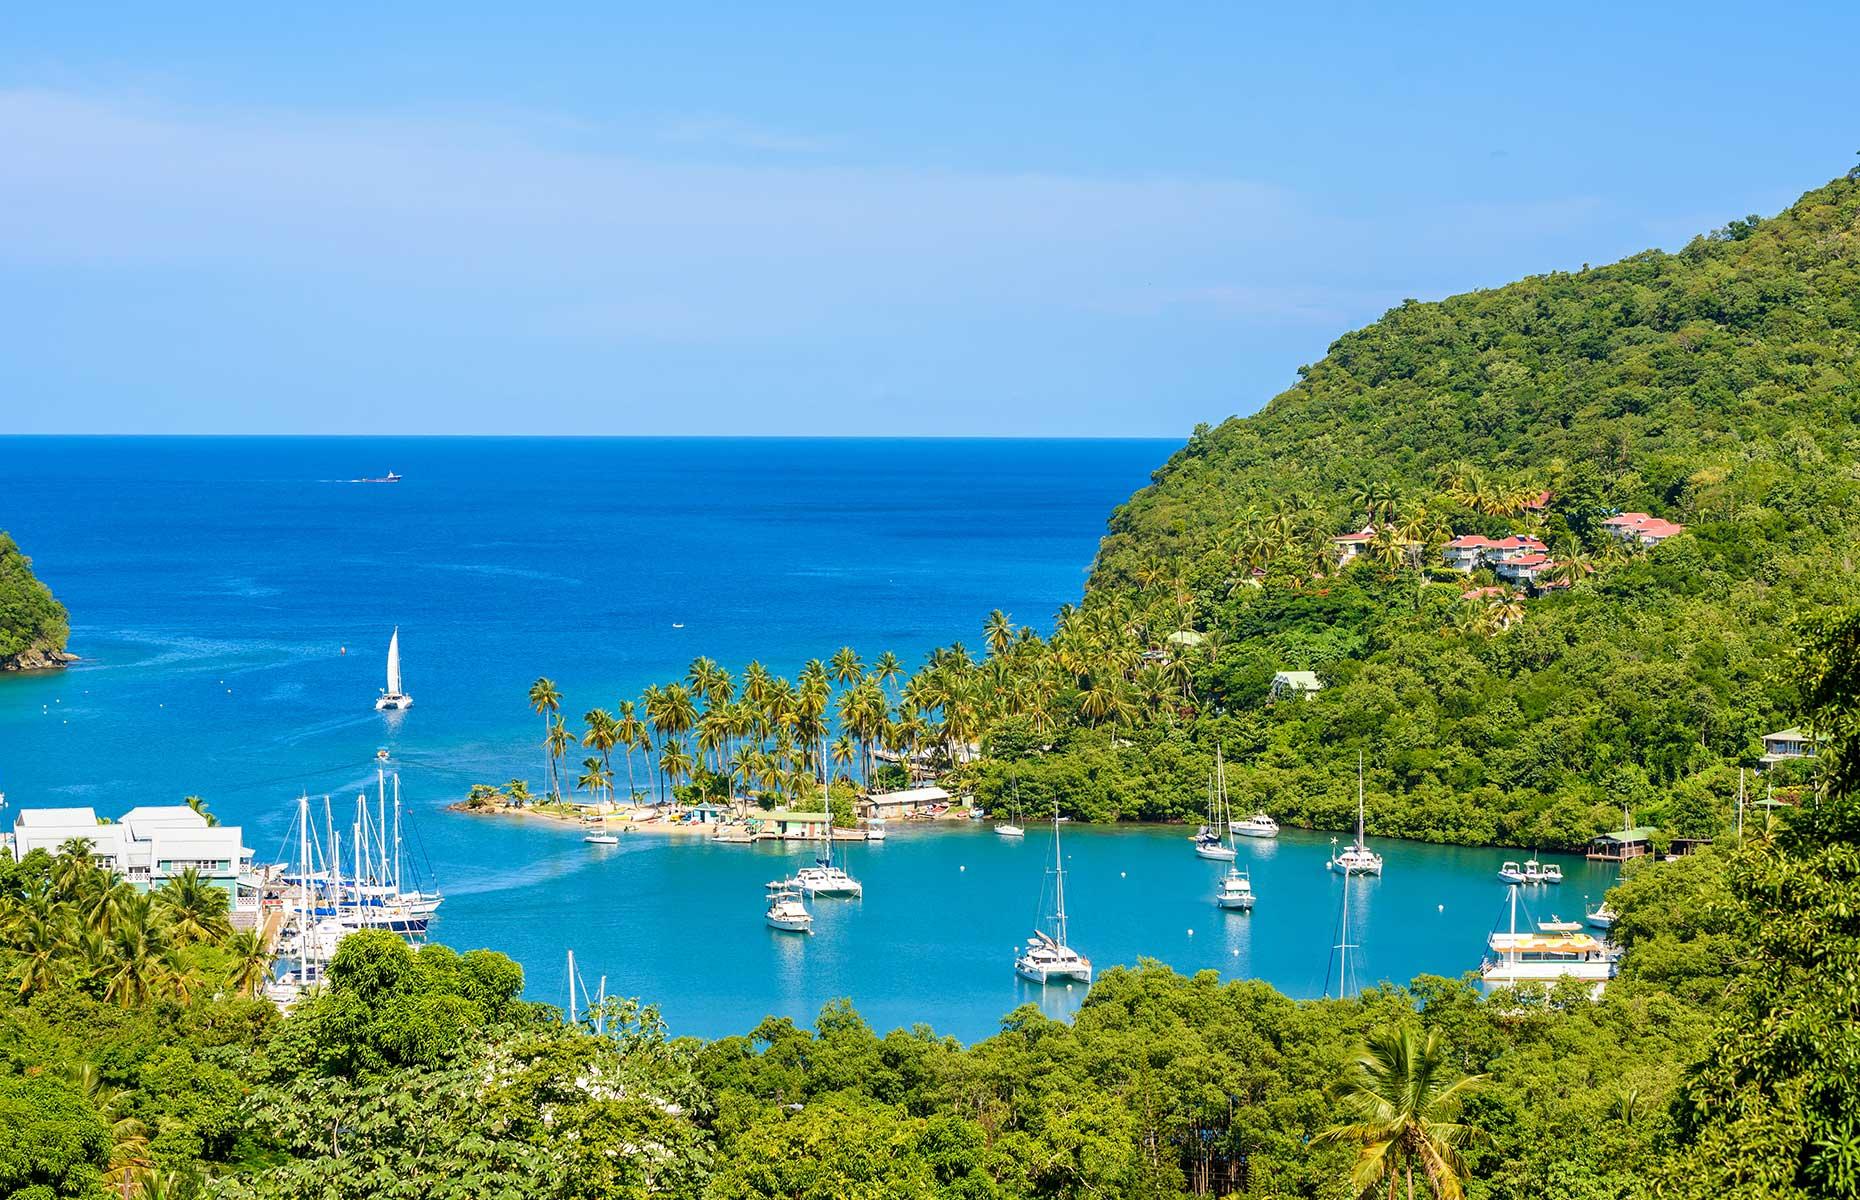 Marigot Bay, Saint Lucia (Image: Simon Dannhauer/Shutterstock)